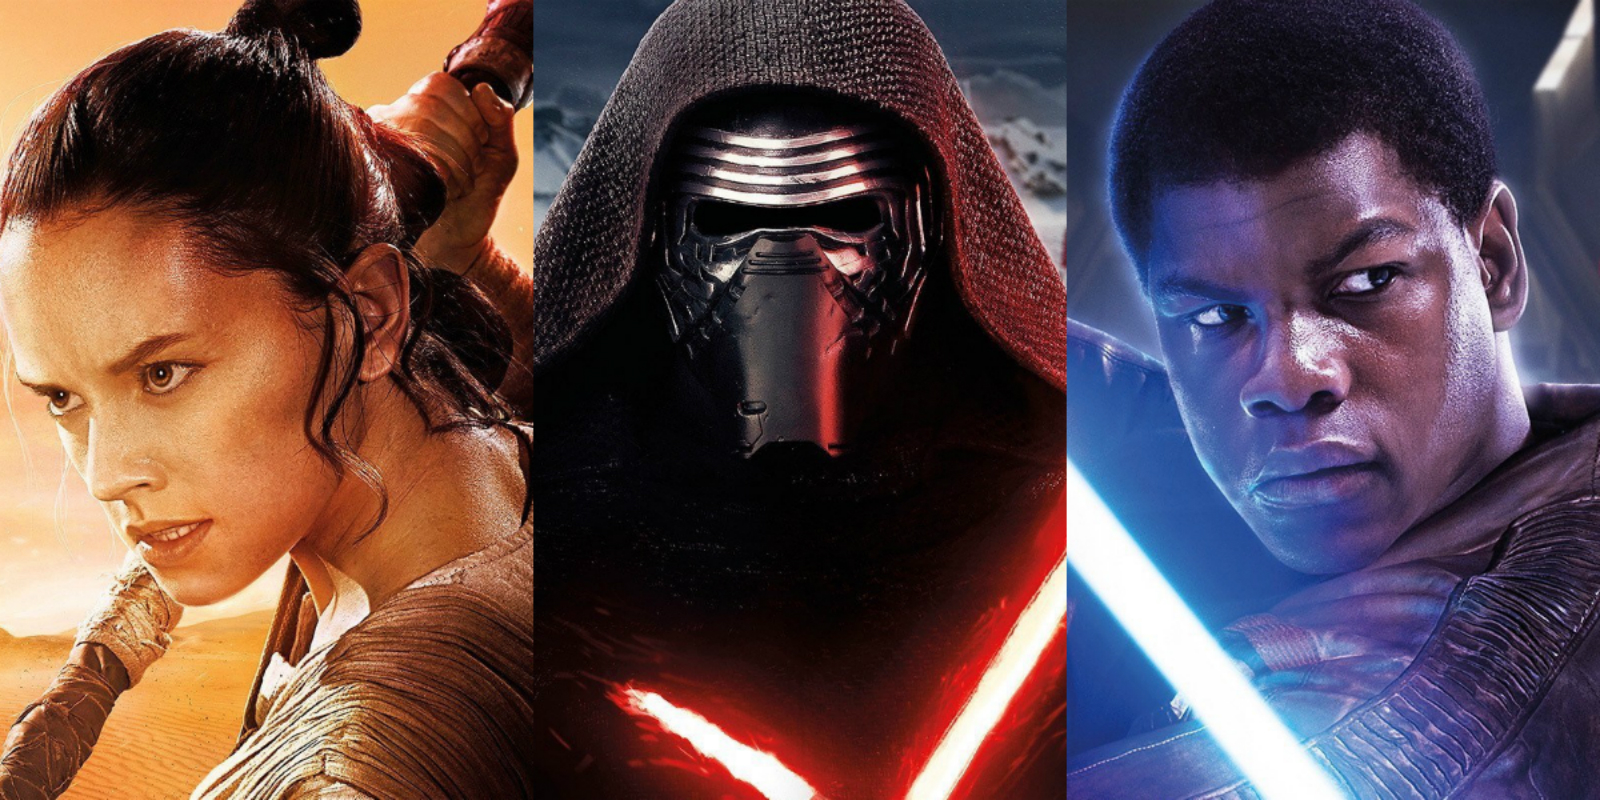 Rian Johnson talks Star Wars 8 story and characters